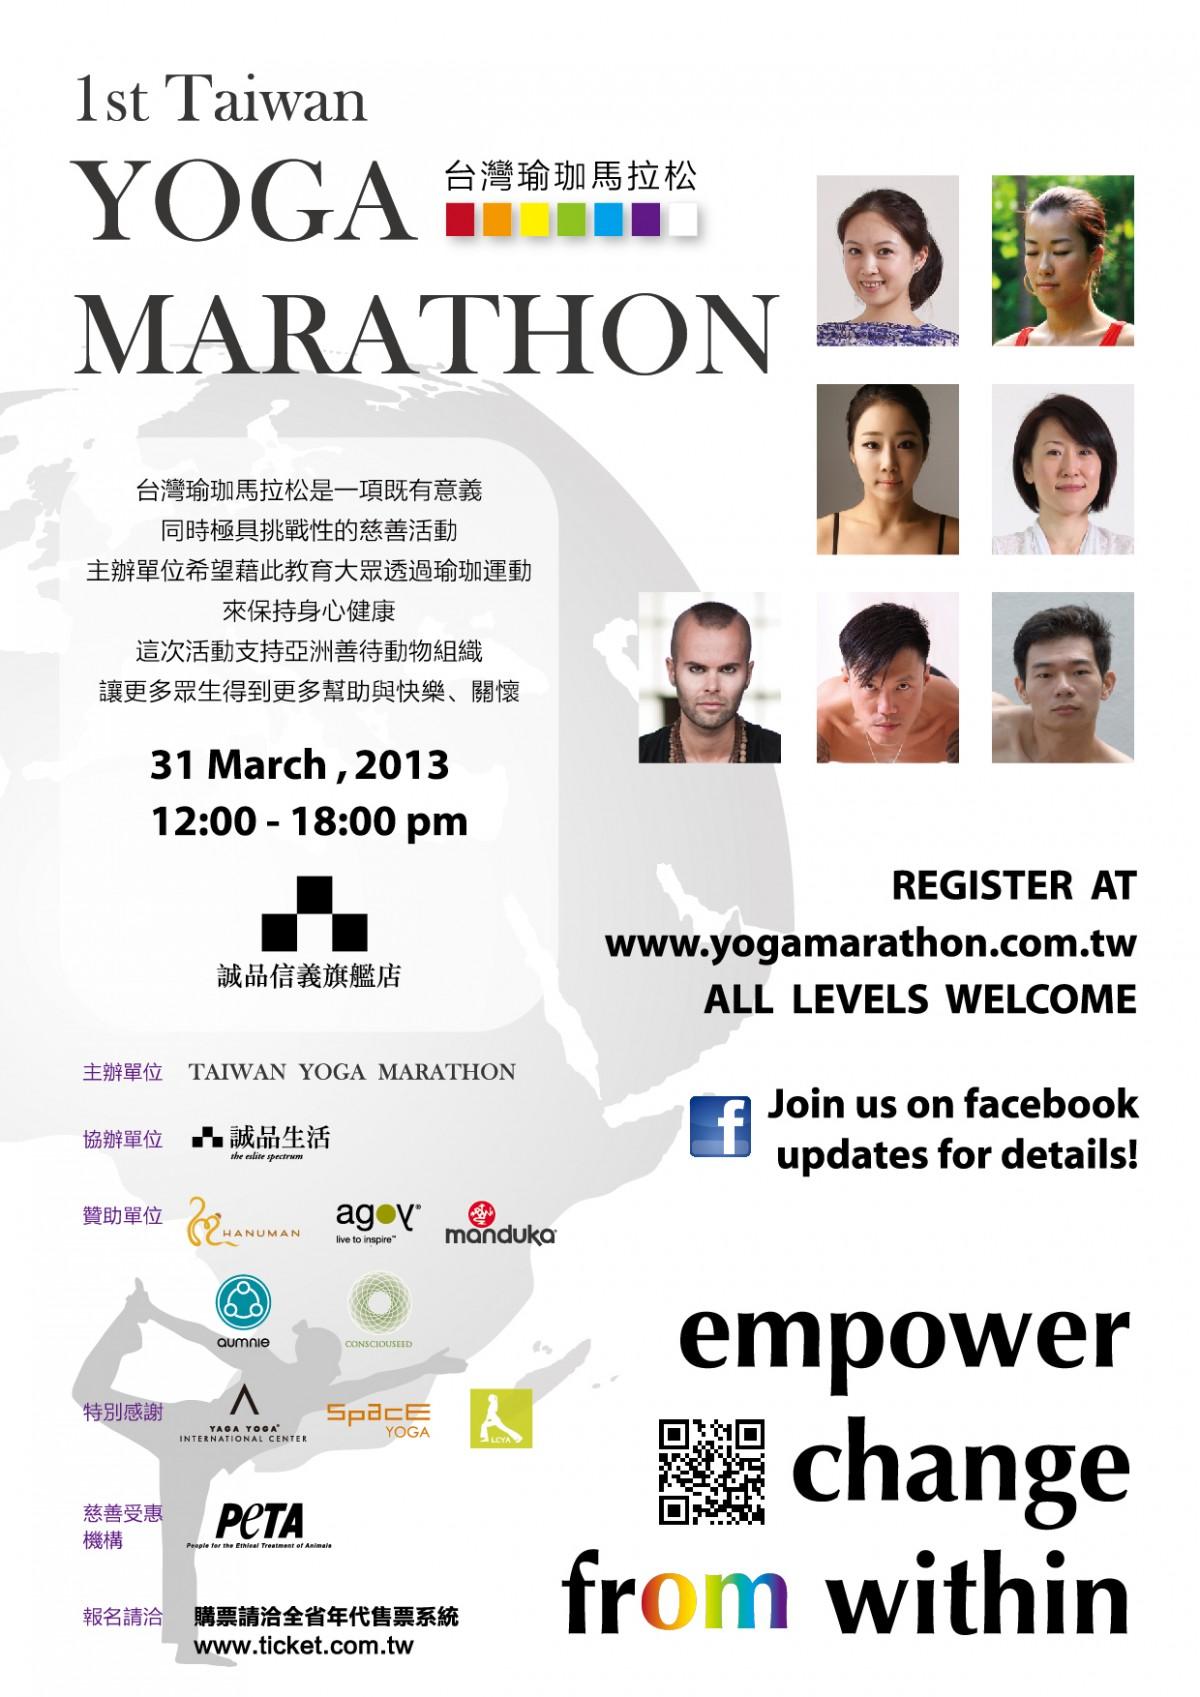 Taiwan yoga marathon